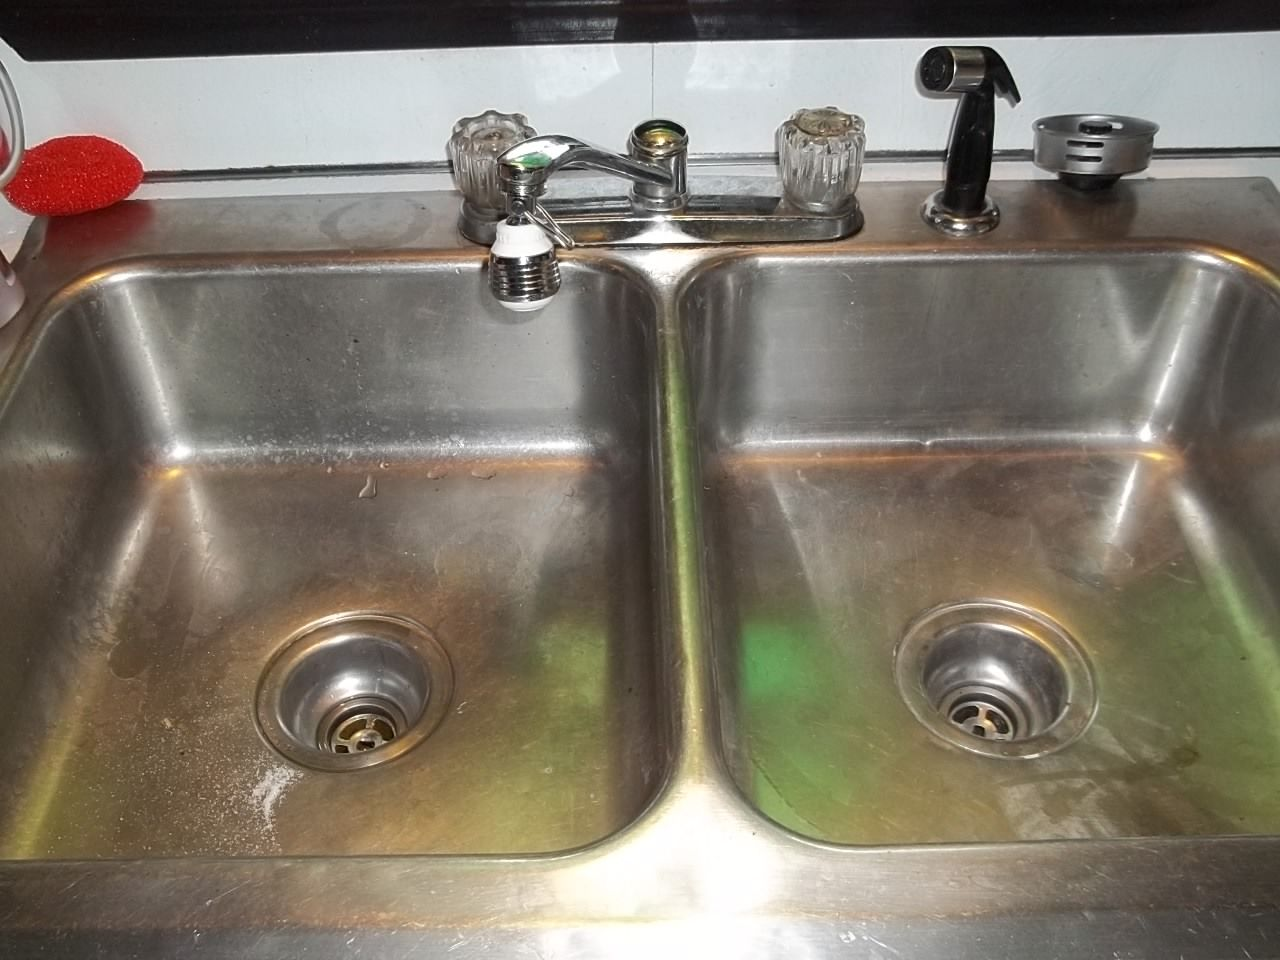 Clogged Kitchen Sink Drano Didnt Work